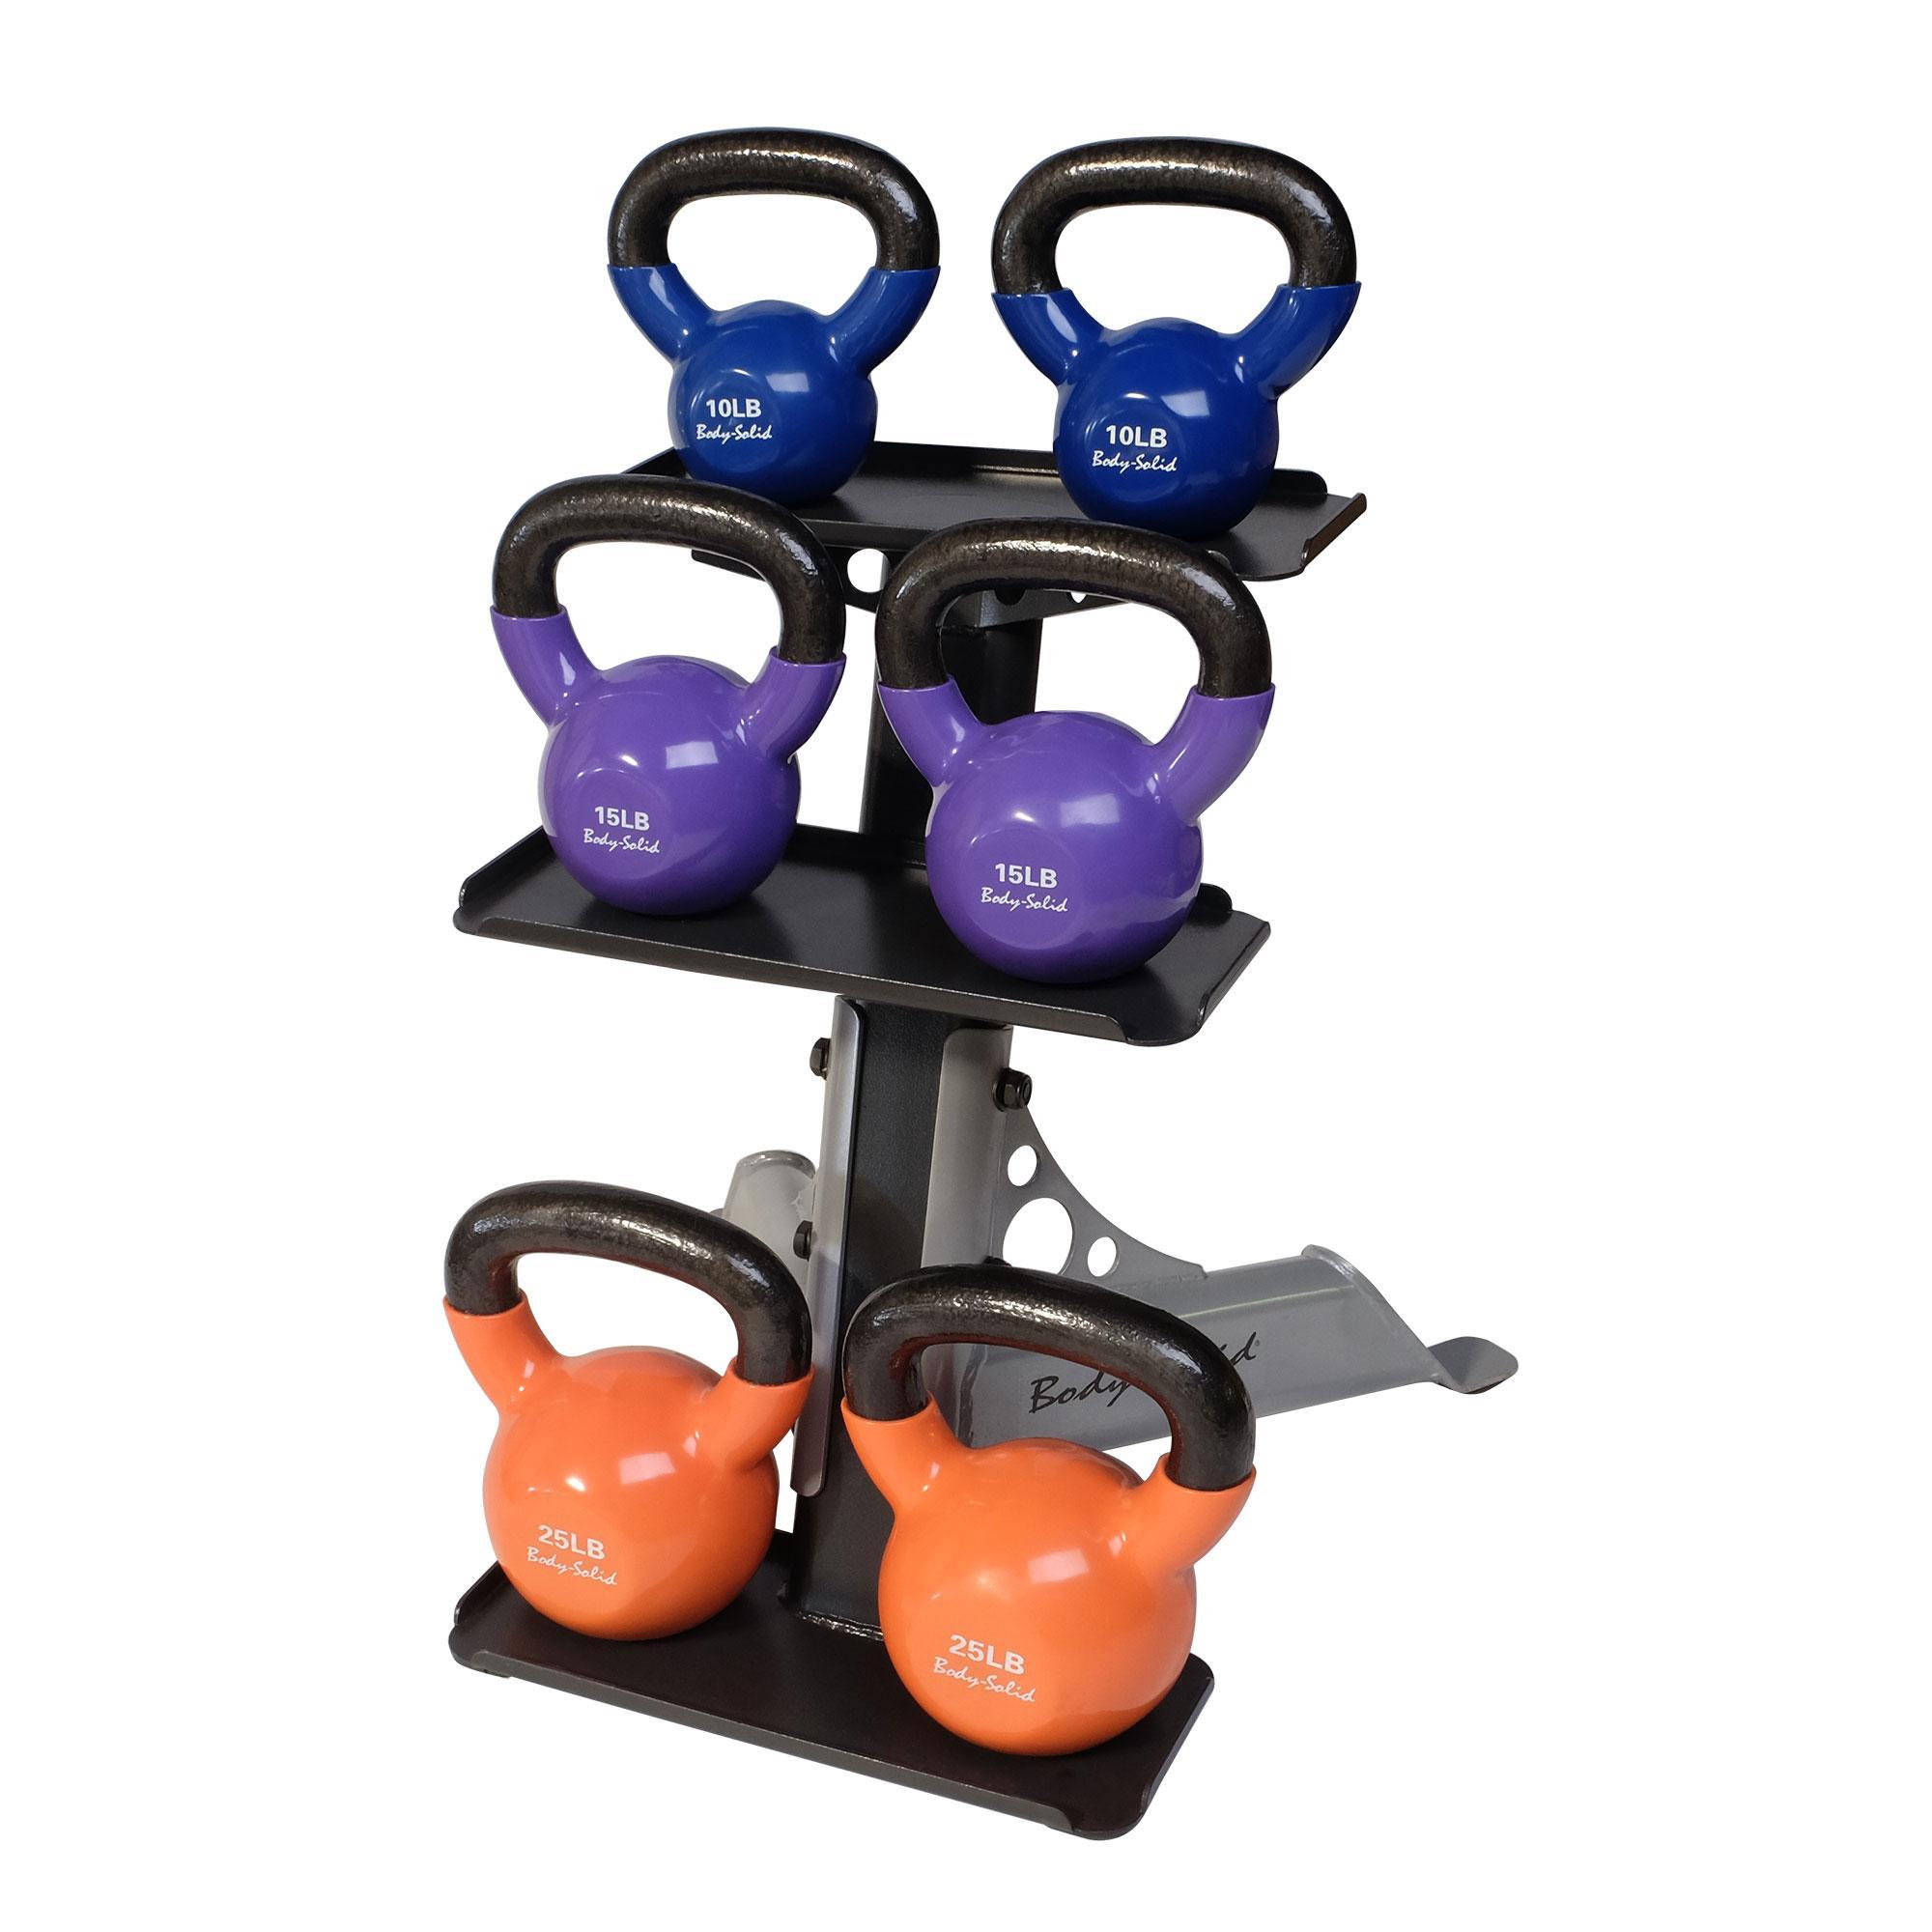 3 Tier Kettlebell Rack Gdkr50: Amazon.com : Body-Solid Kettle Bell Rack : Kettlebell